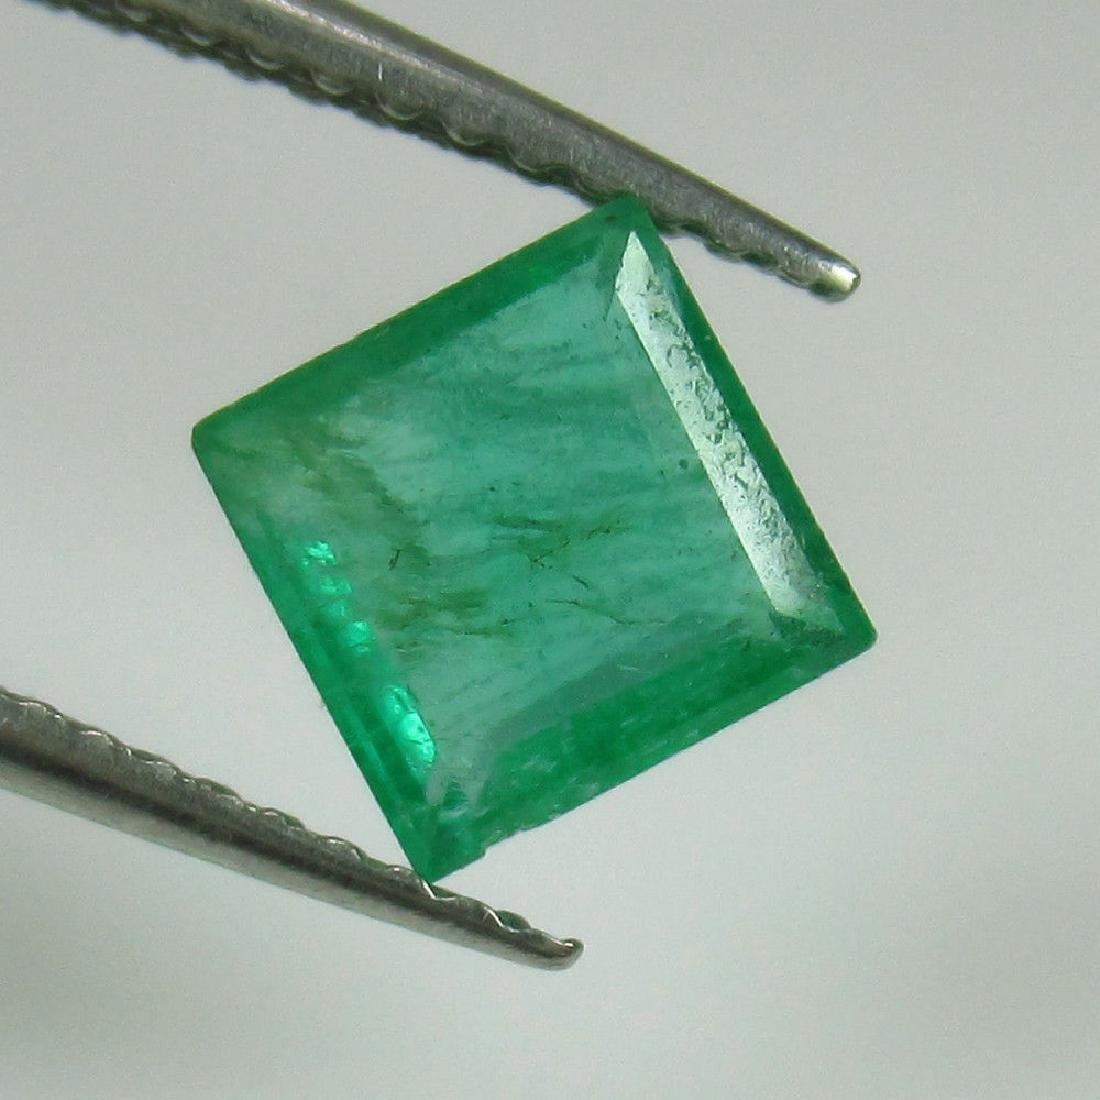 1.19 Ct Genuine Zambian Emerald 6.2X6.2 mm Square Cut